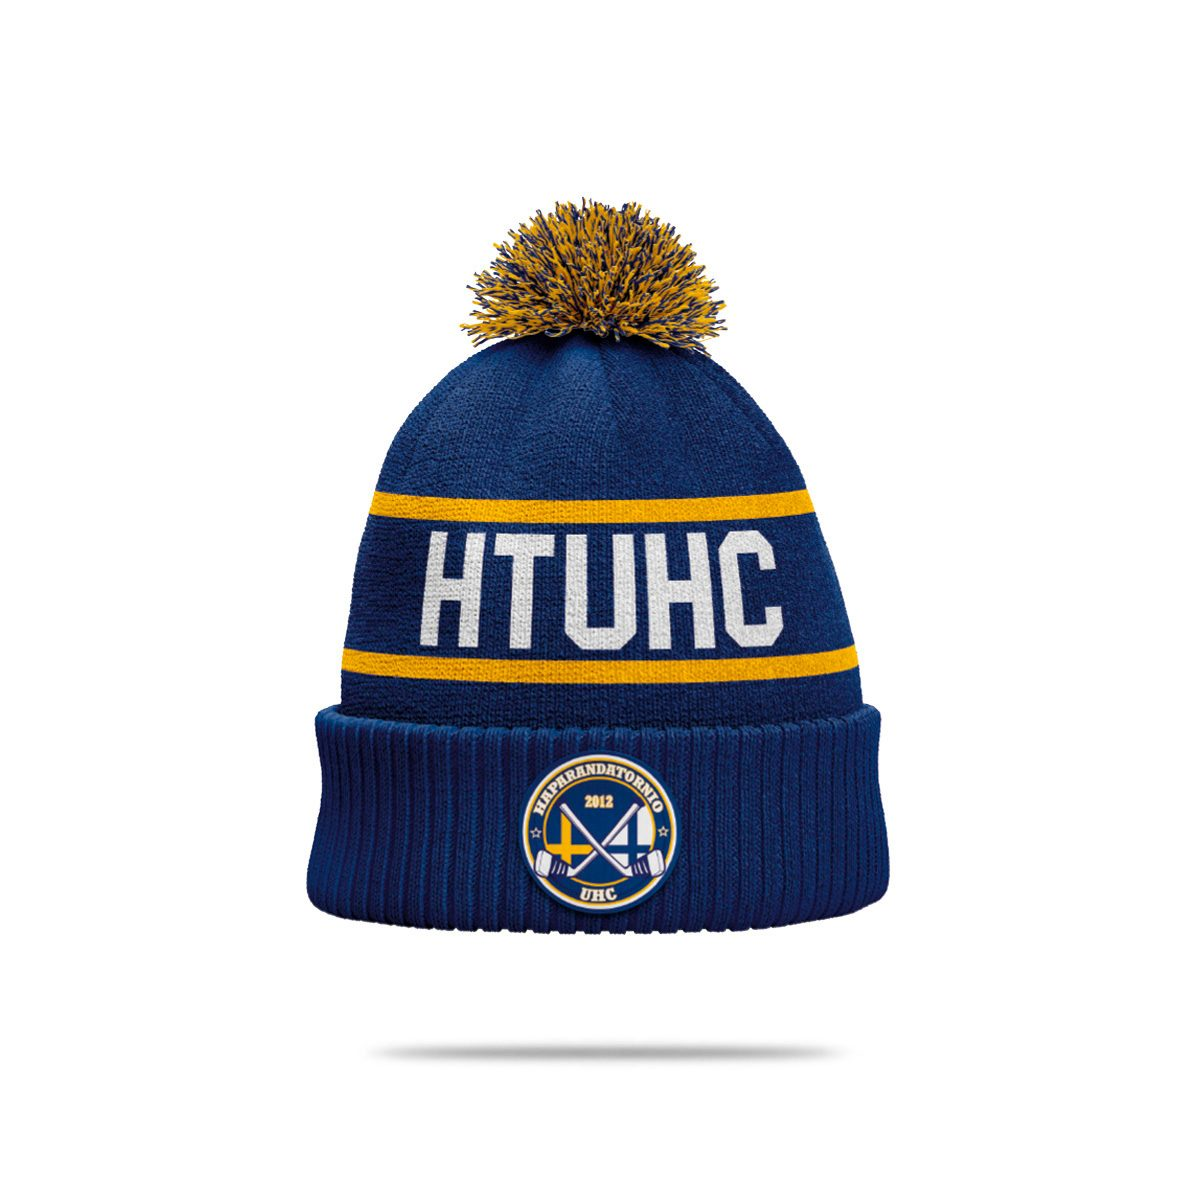 HTUHC-3035